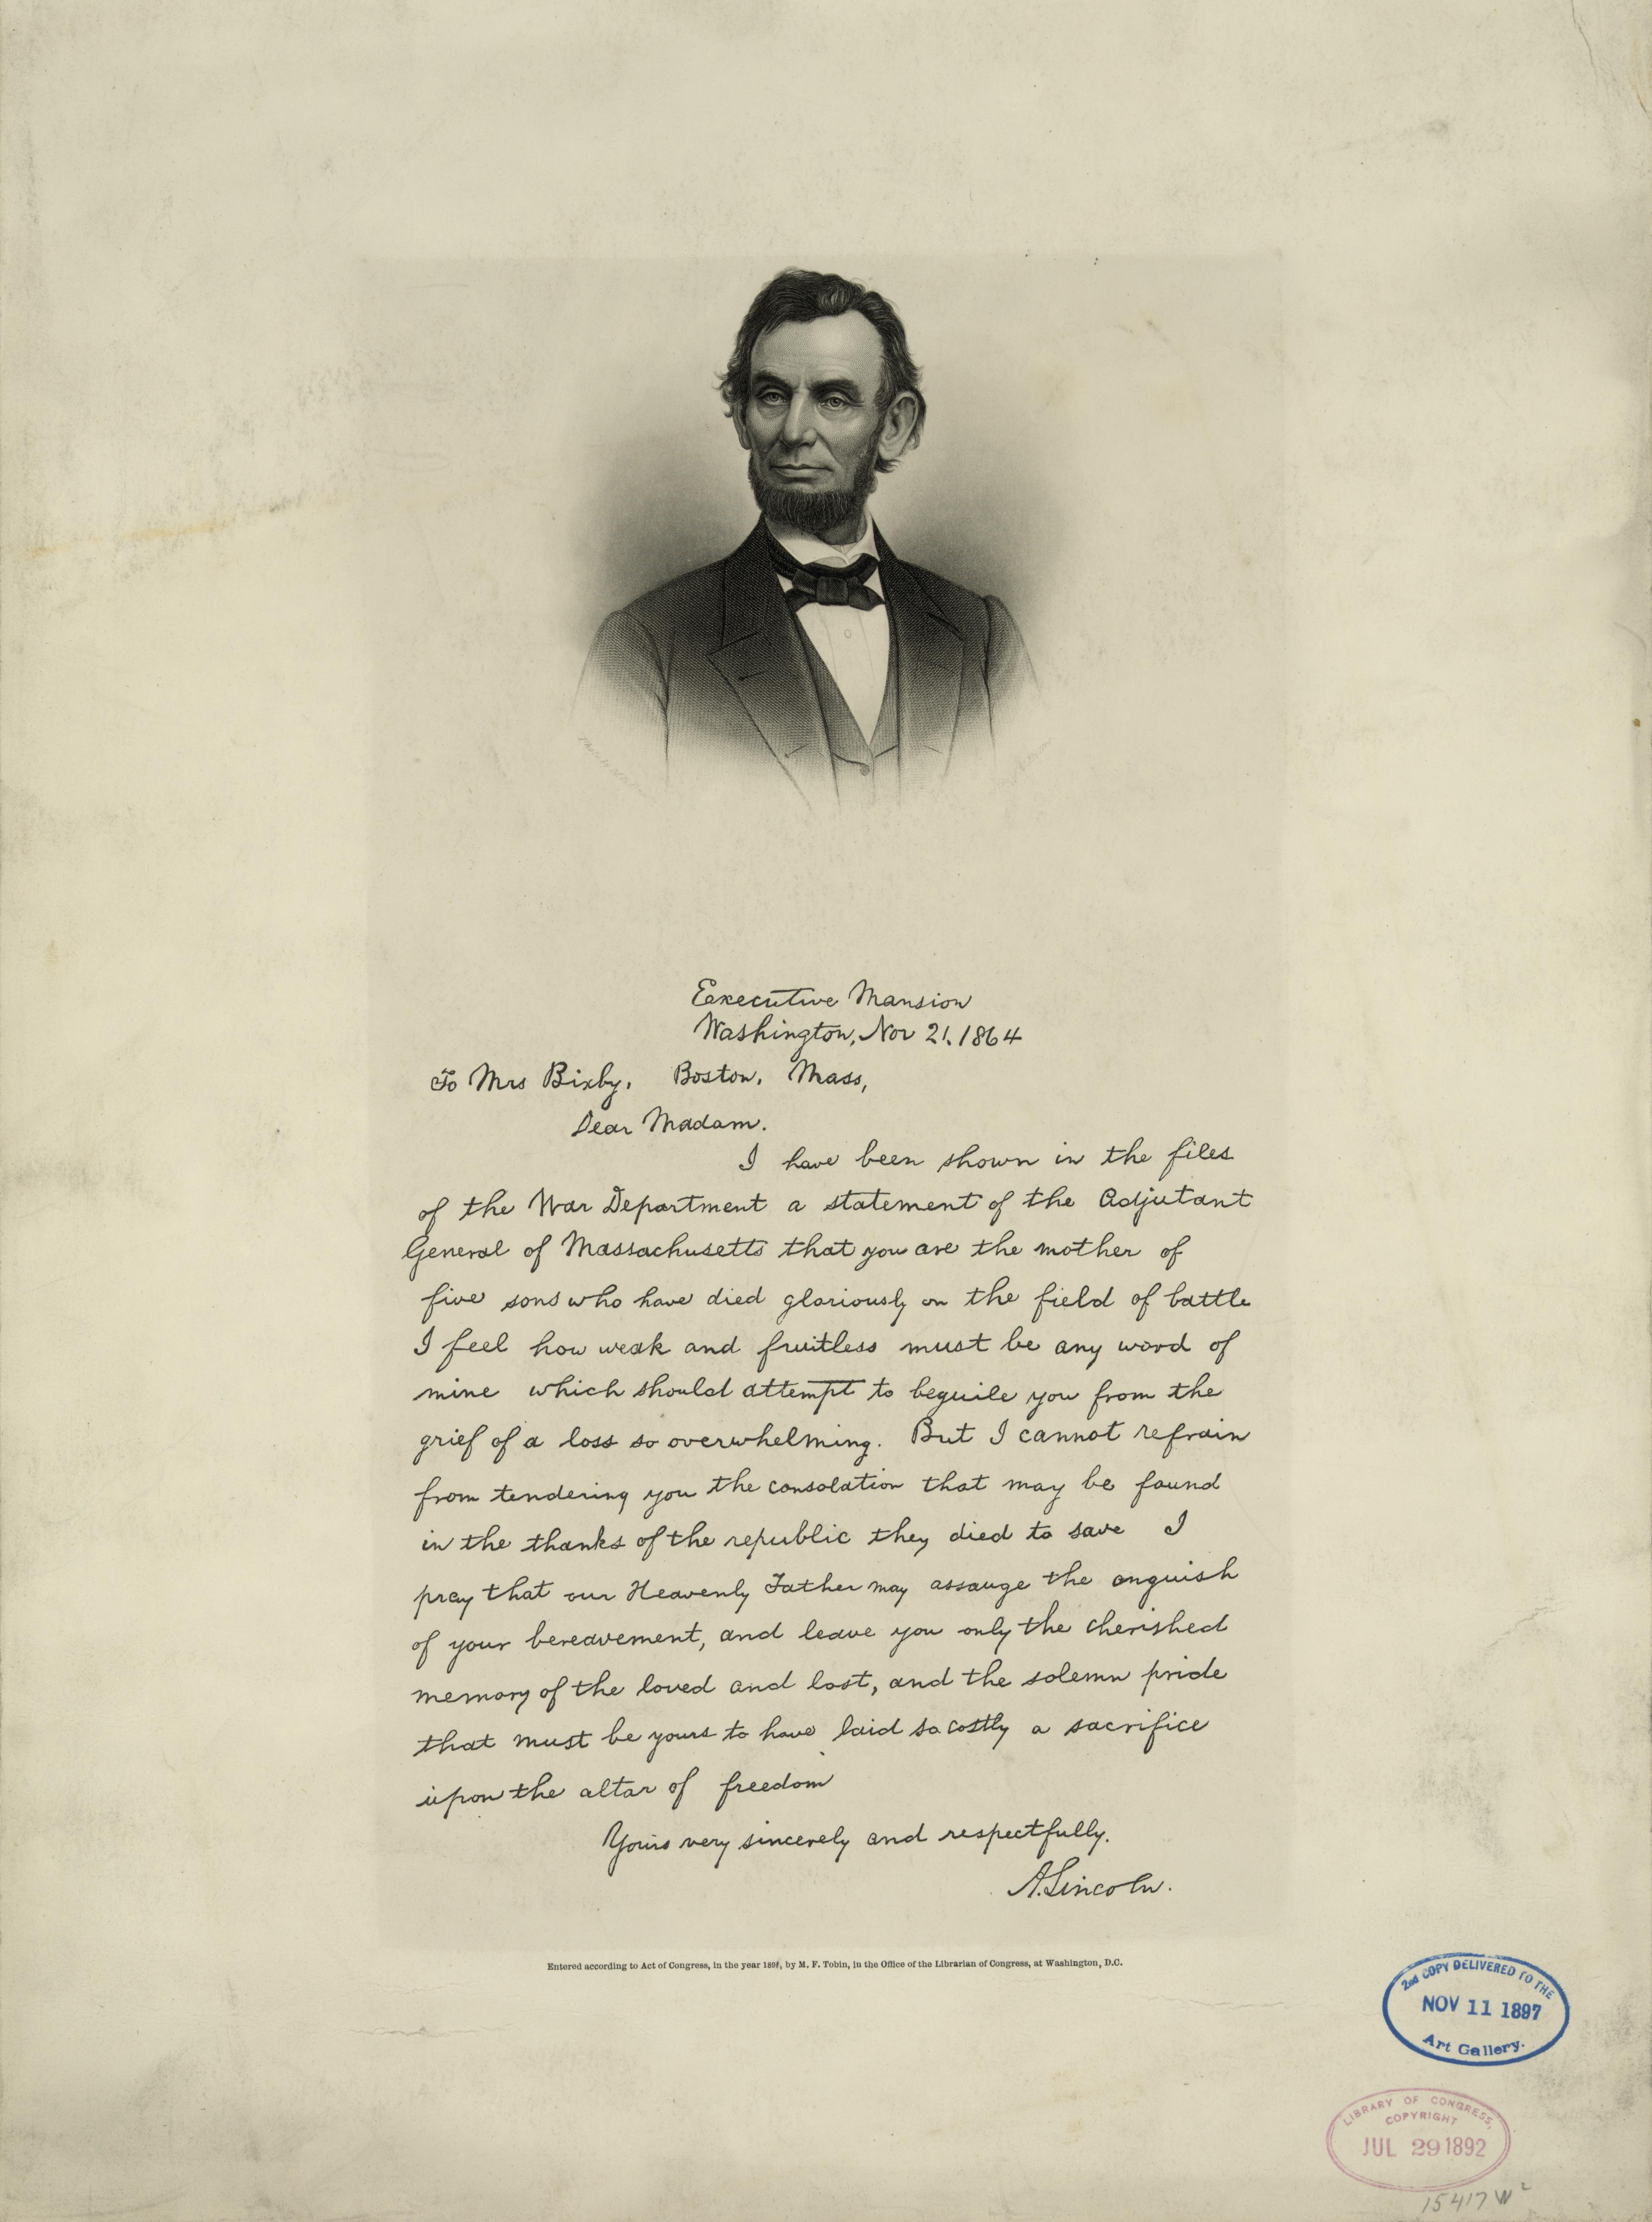 File:Bixby Letter (Tobin facsimile) jpg - Wikimedia Commons